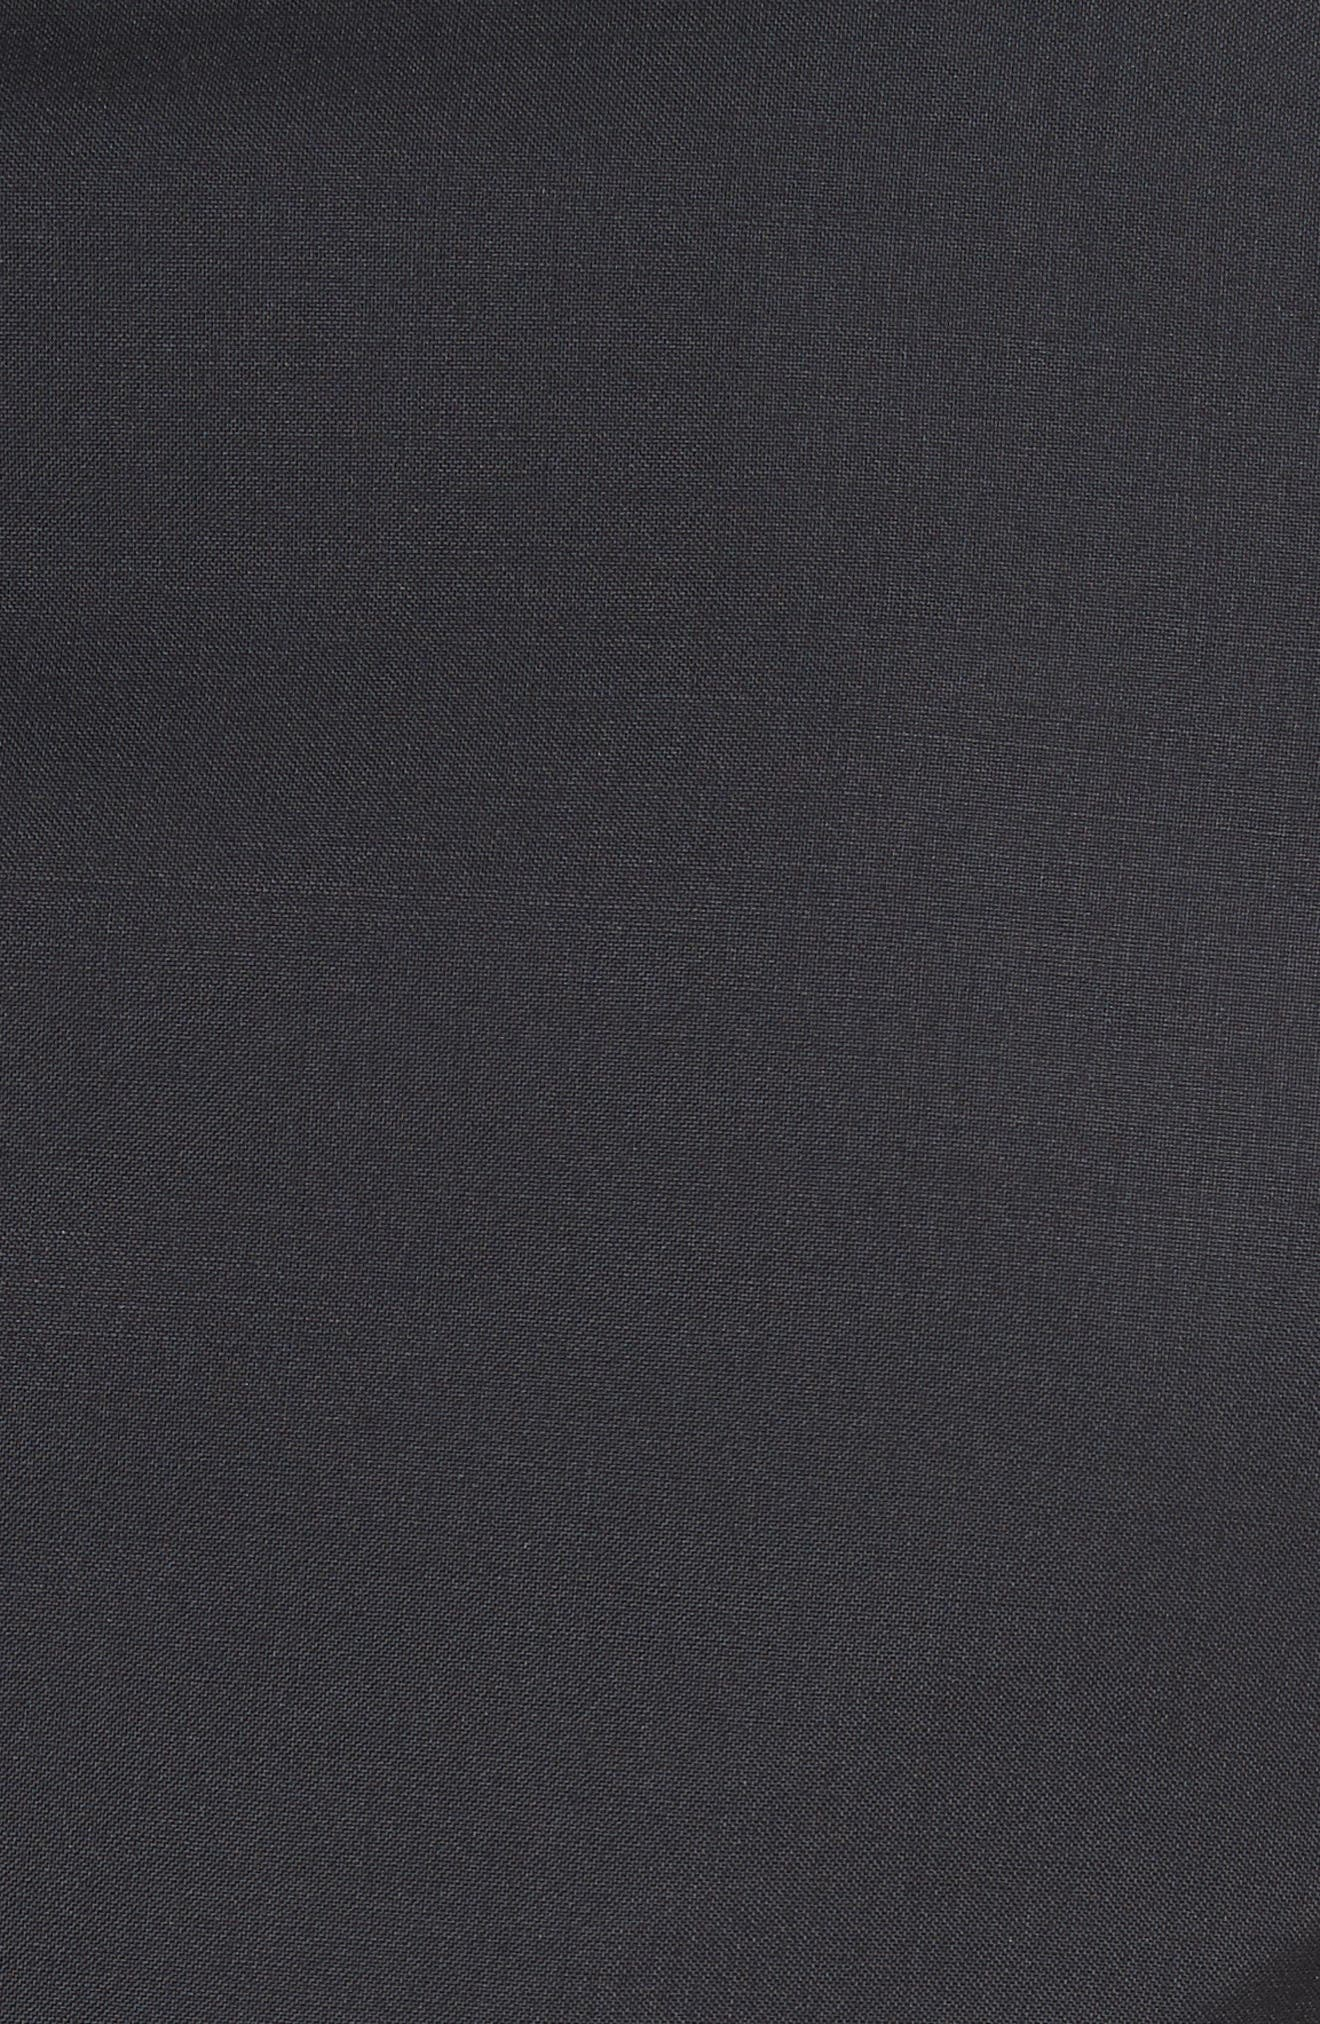 Peak Lapel Wool Blend Tuxedo,                             Alternate thumbnail 7, color,                             410